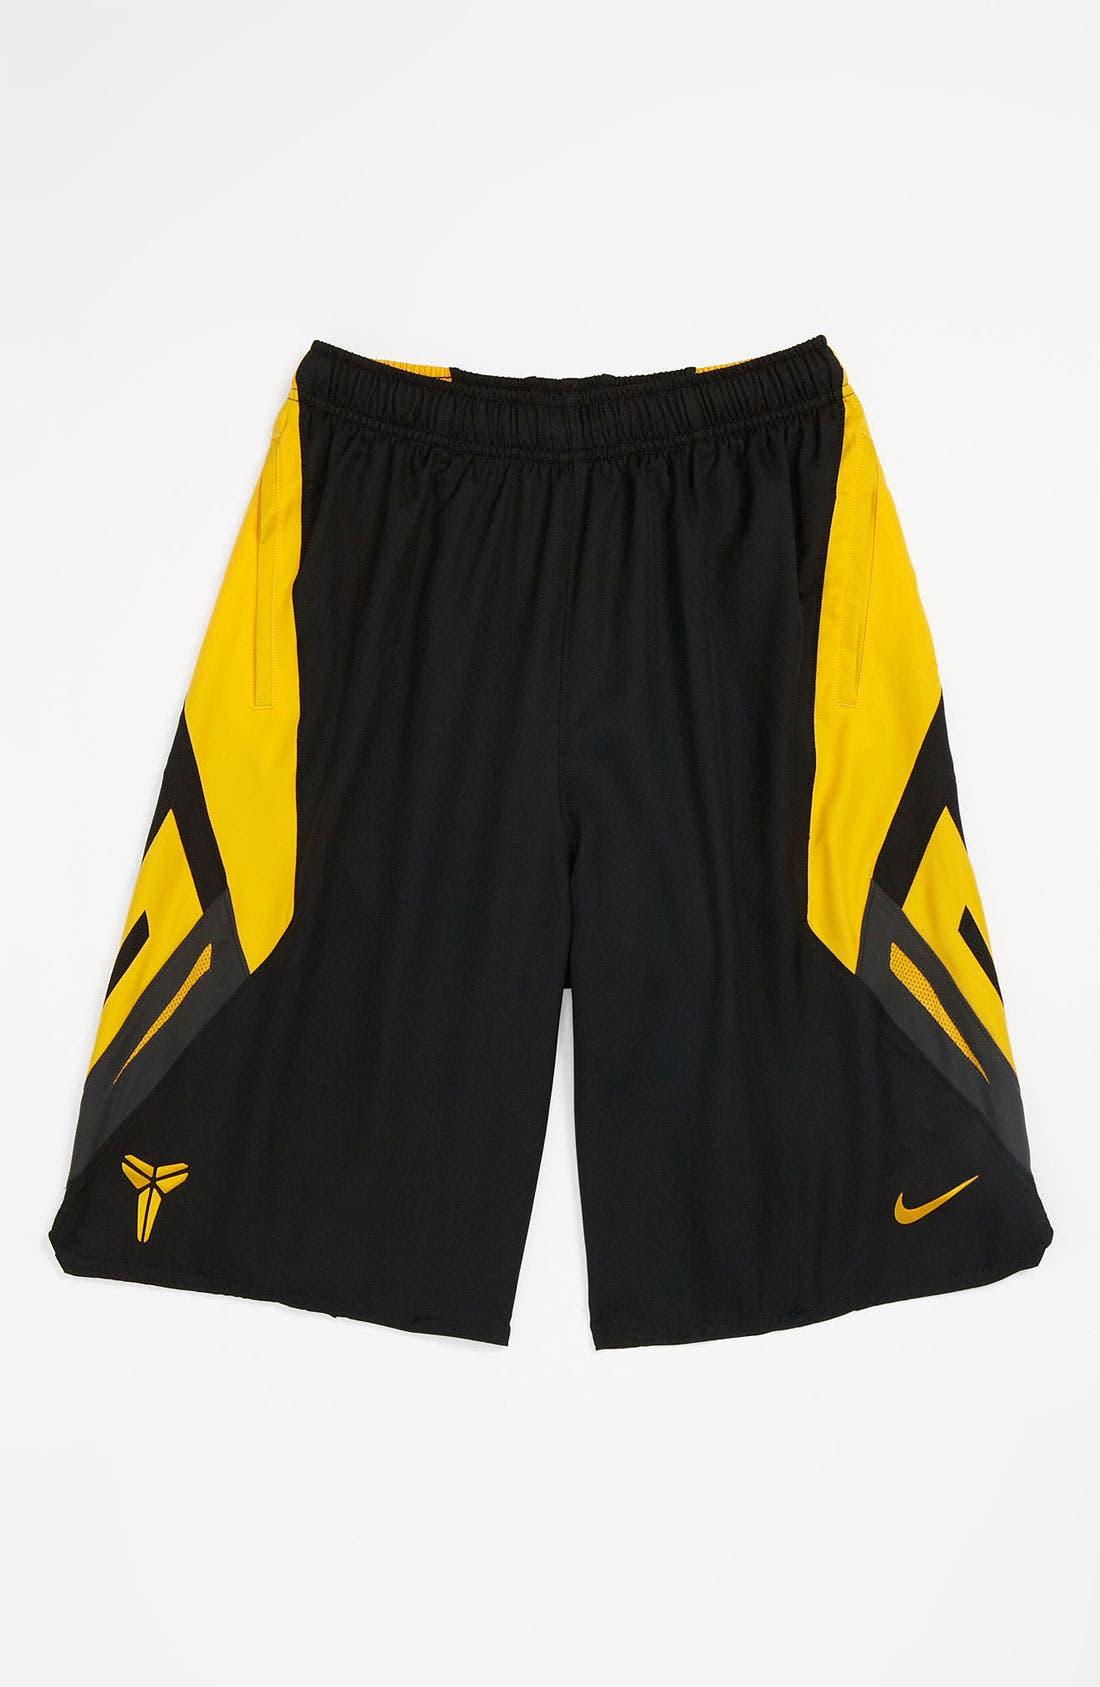 Main Image - Nike 'Kobe Game Time' Shorts (Big Boys)